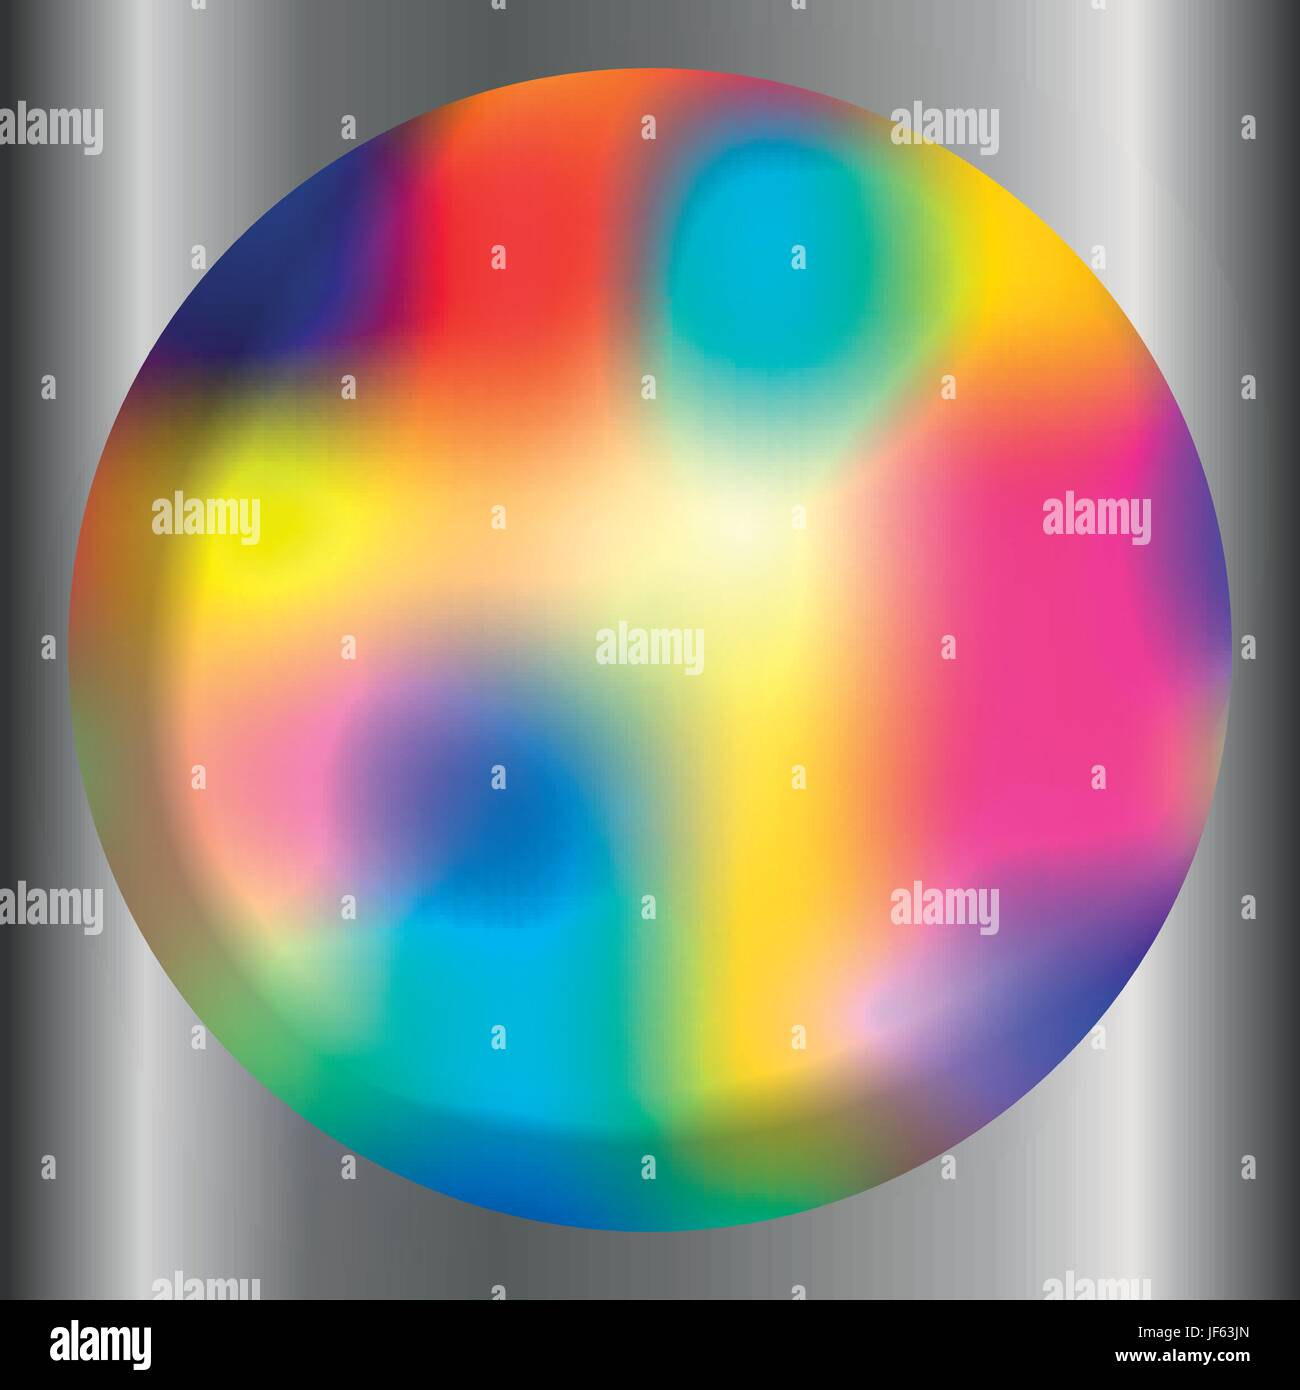 arc, blurred, gradient, metallic, curve, shaddow, shadow, arc, blurred, - Stock Vector